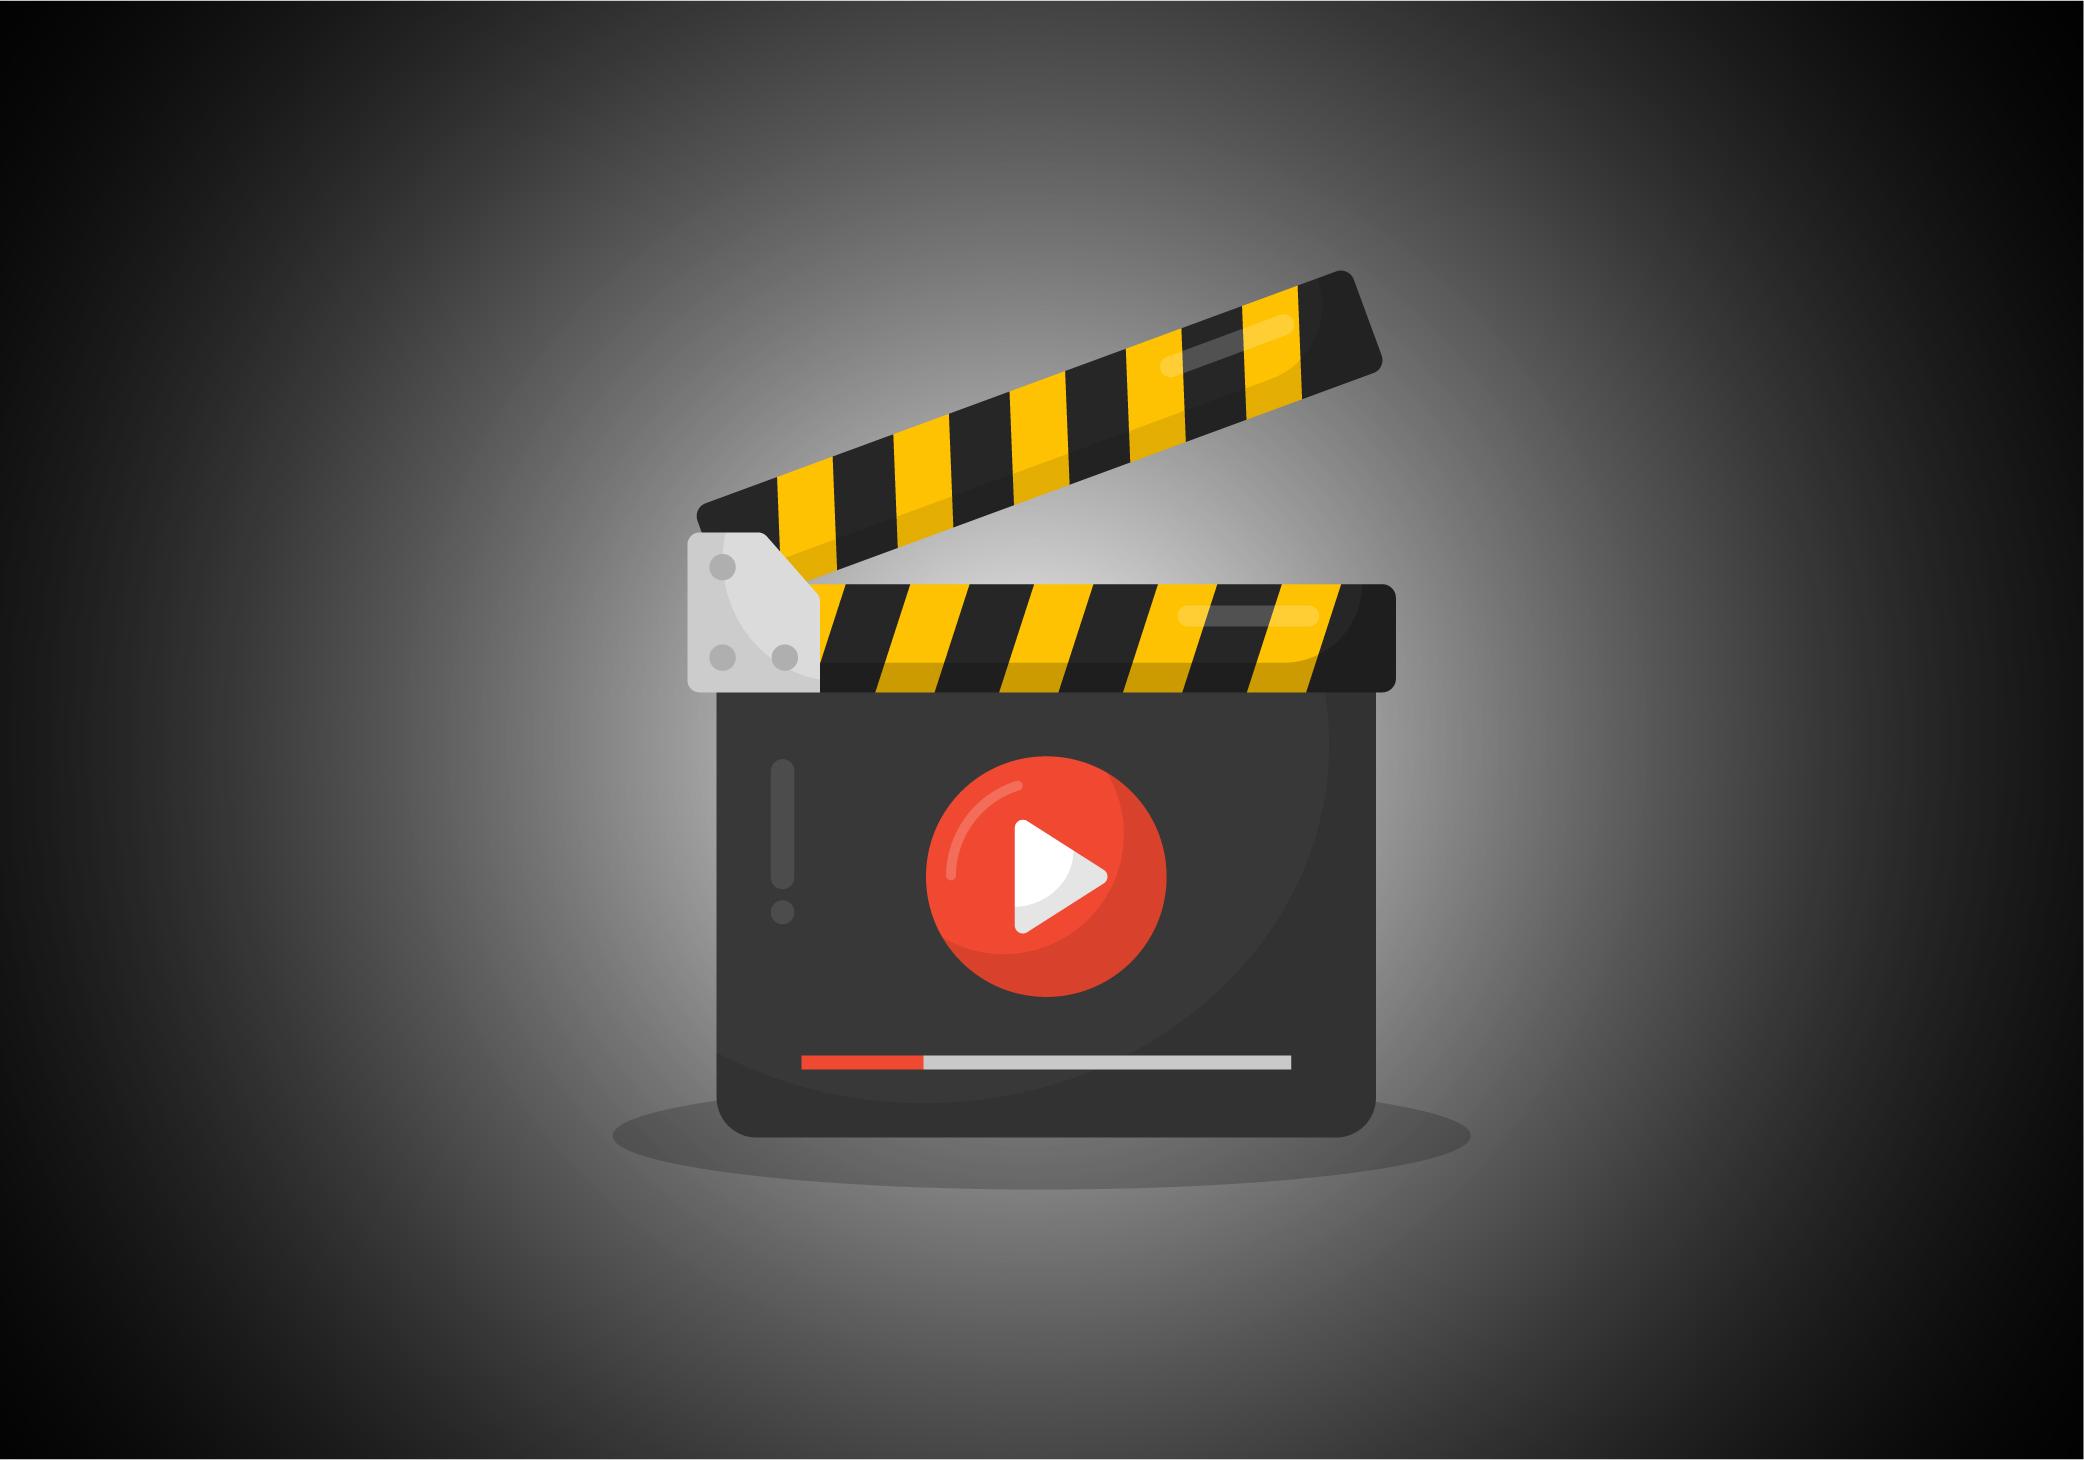 Download Film Production Vector Illustration